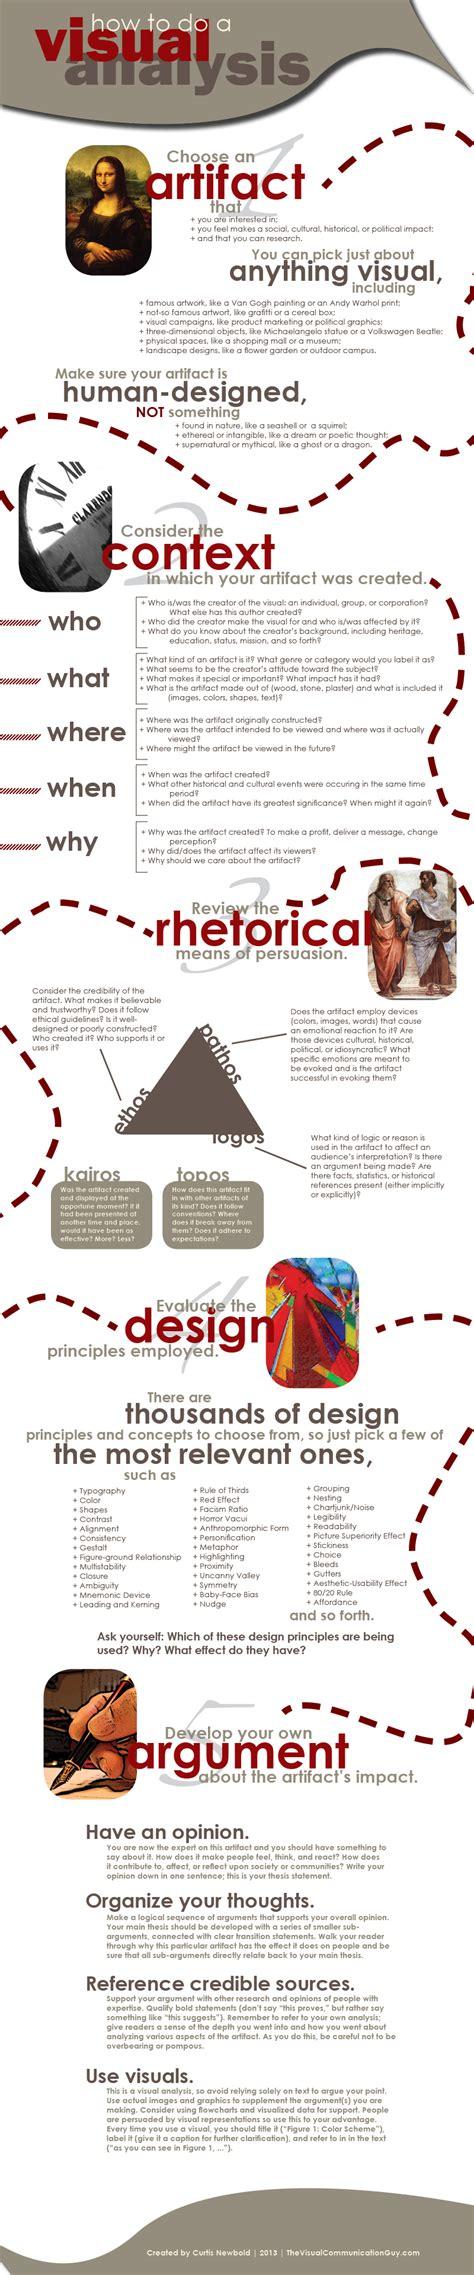 ad analysis sle essay visual rhetorical analysis essay sle 28 images visual